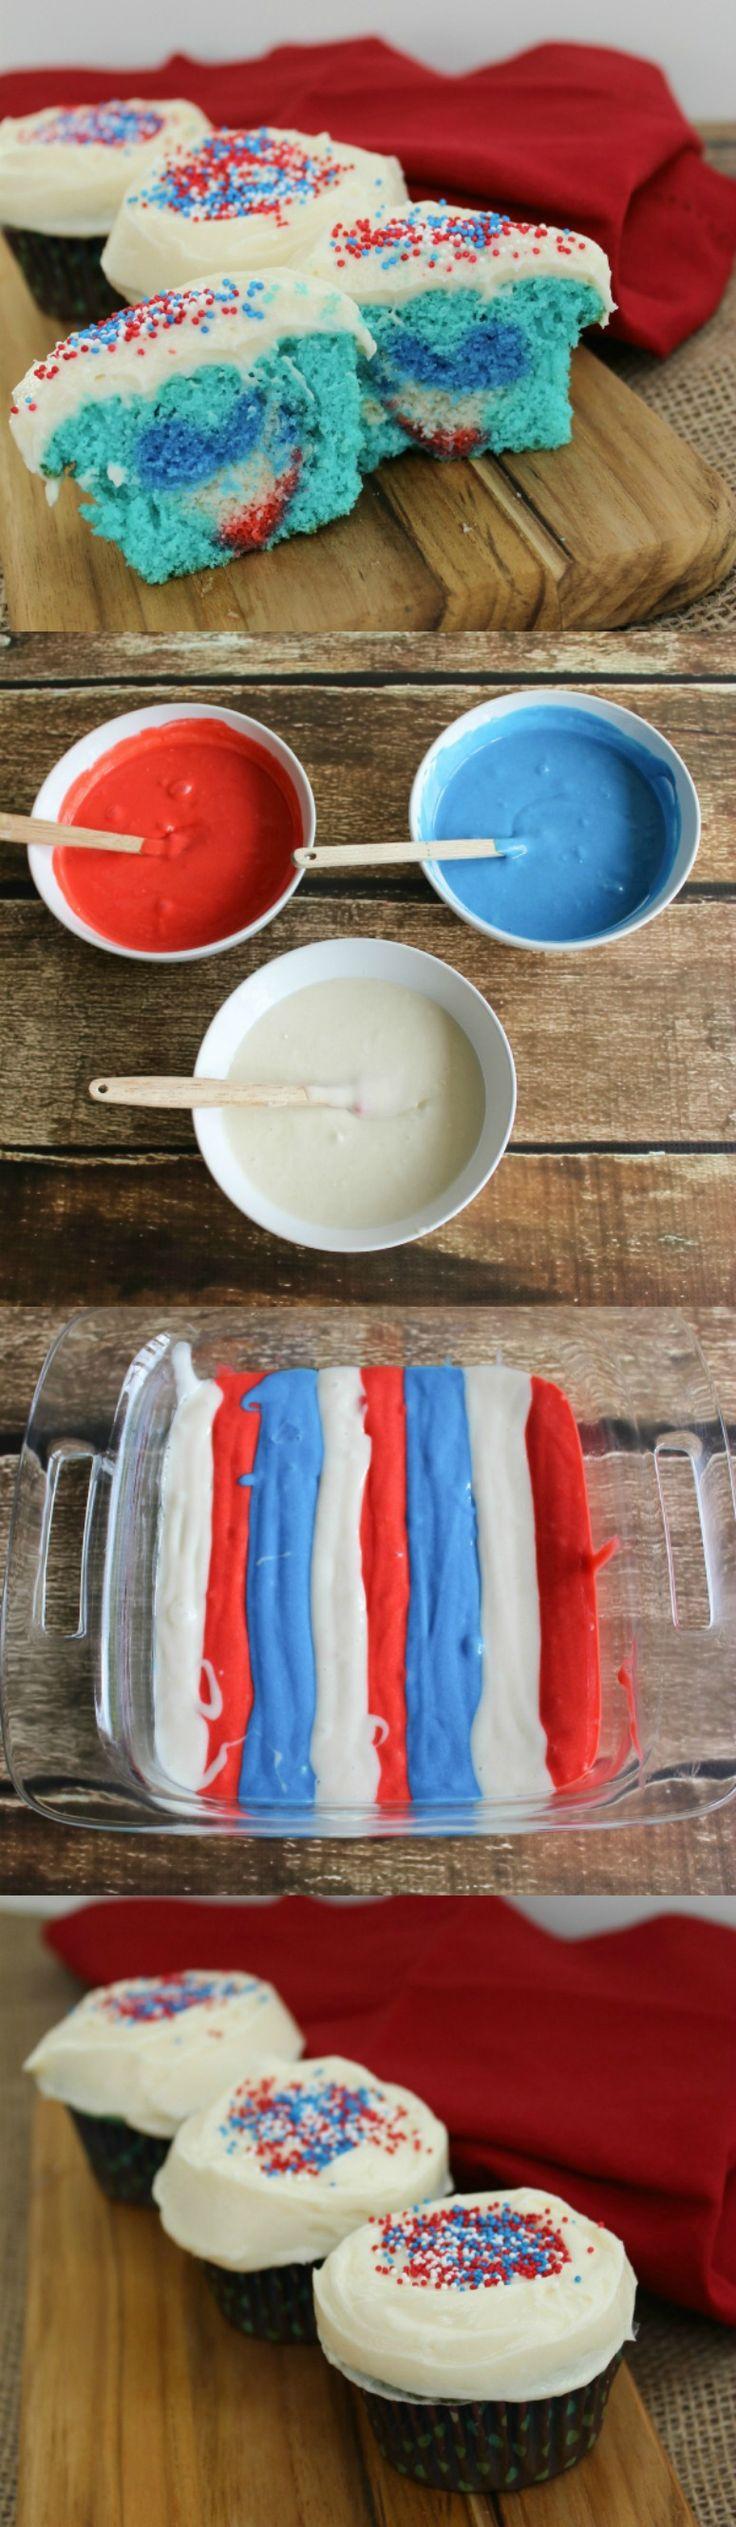 Patriotic Cupcake tutorial for a surprise heart inside.